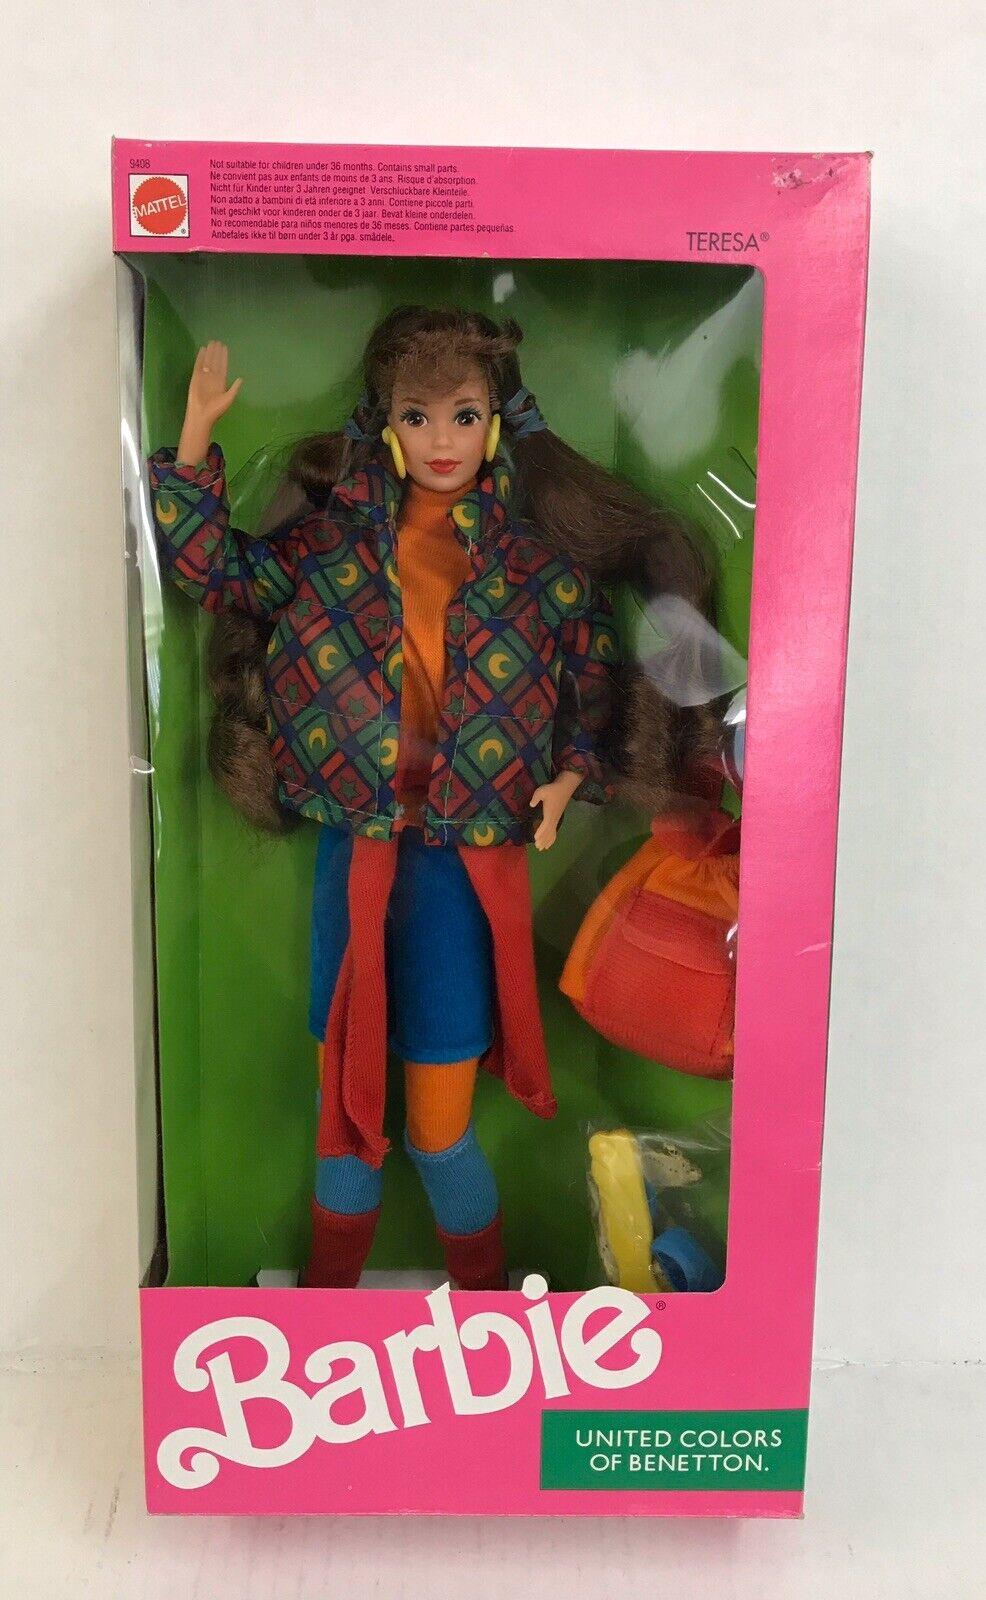 Intuición Electricista Polar  1990 United Colors of BENETTON Teresa Non USA Barbie Doll NRFB 9408 Red  Hair for sale online | eBay